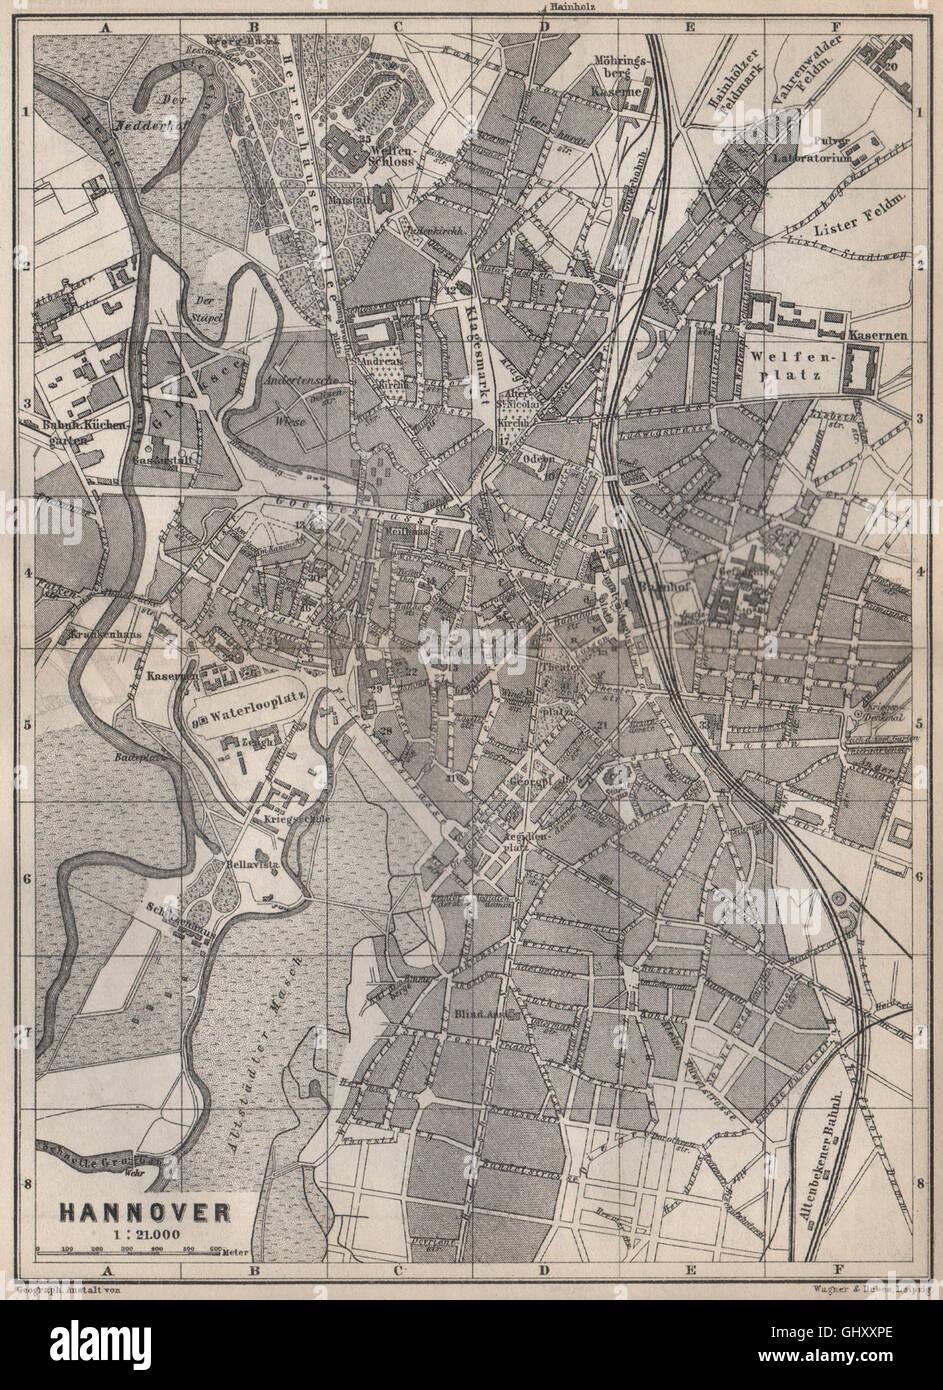 HANNOVER antique town city stadtplan Hanover Lower Saxony karte